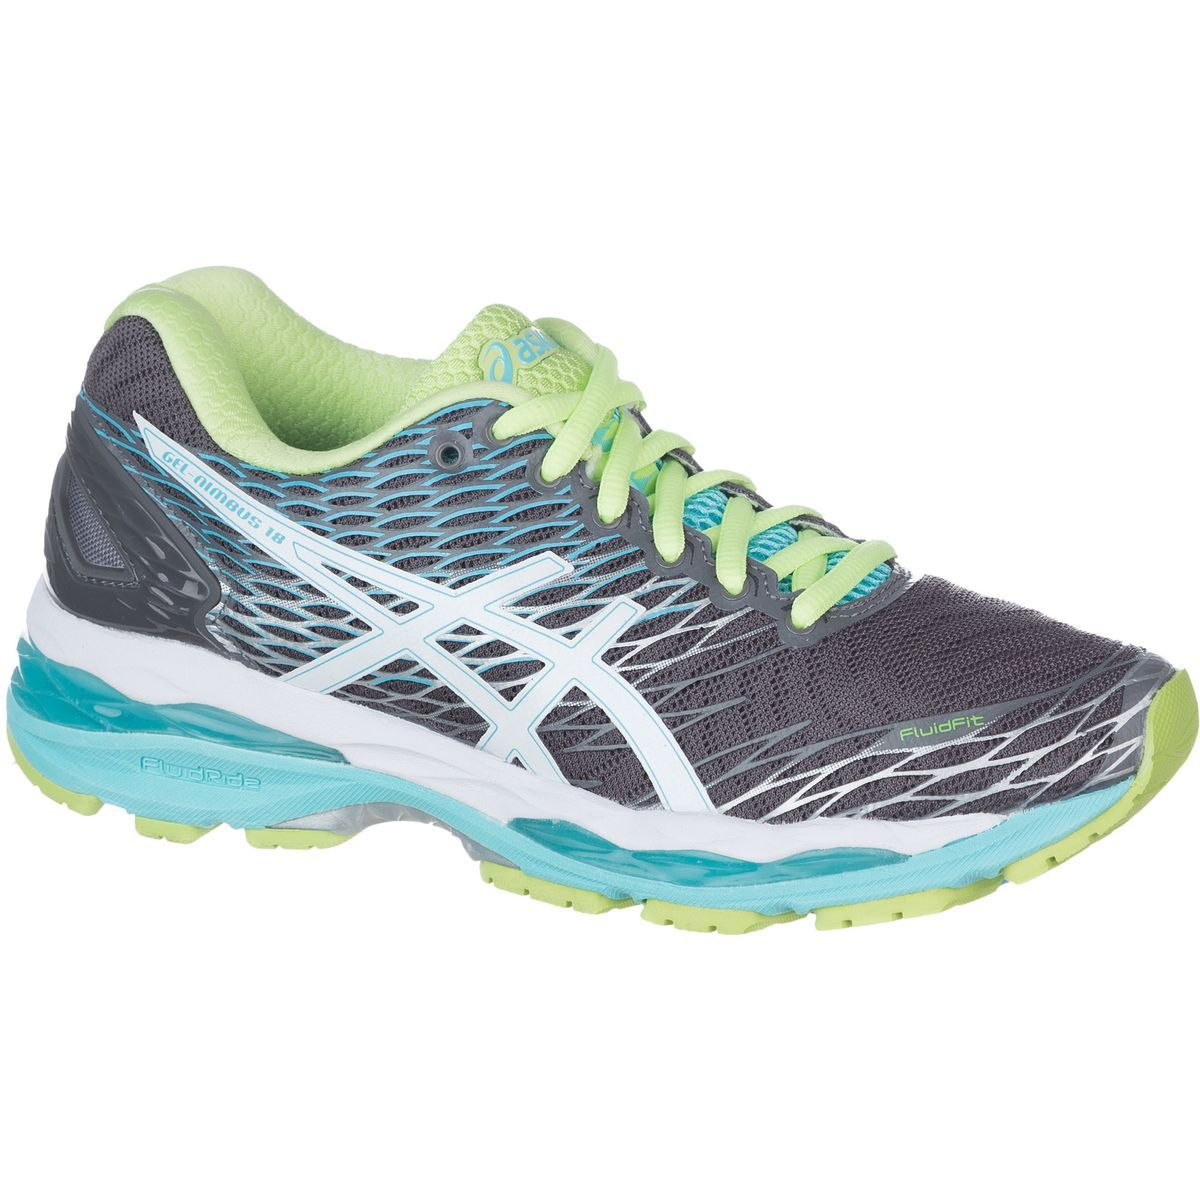 Asics GelNimbus 18 Narrow Running Shoe Titanium/White/Turquoise 6 5